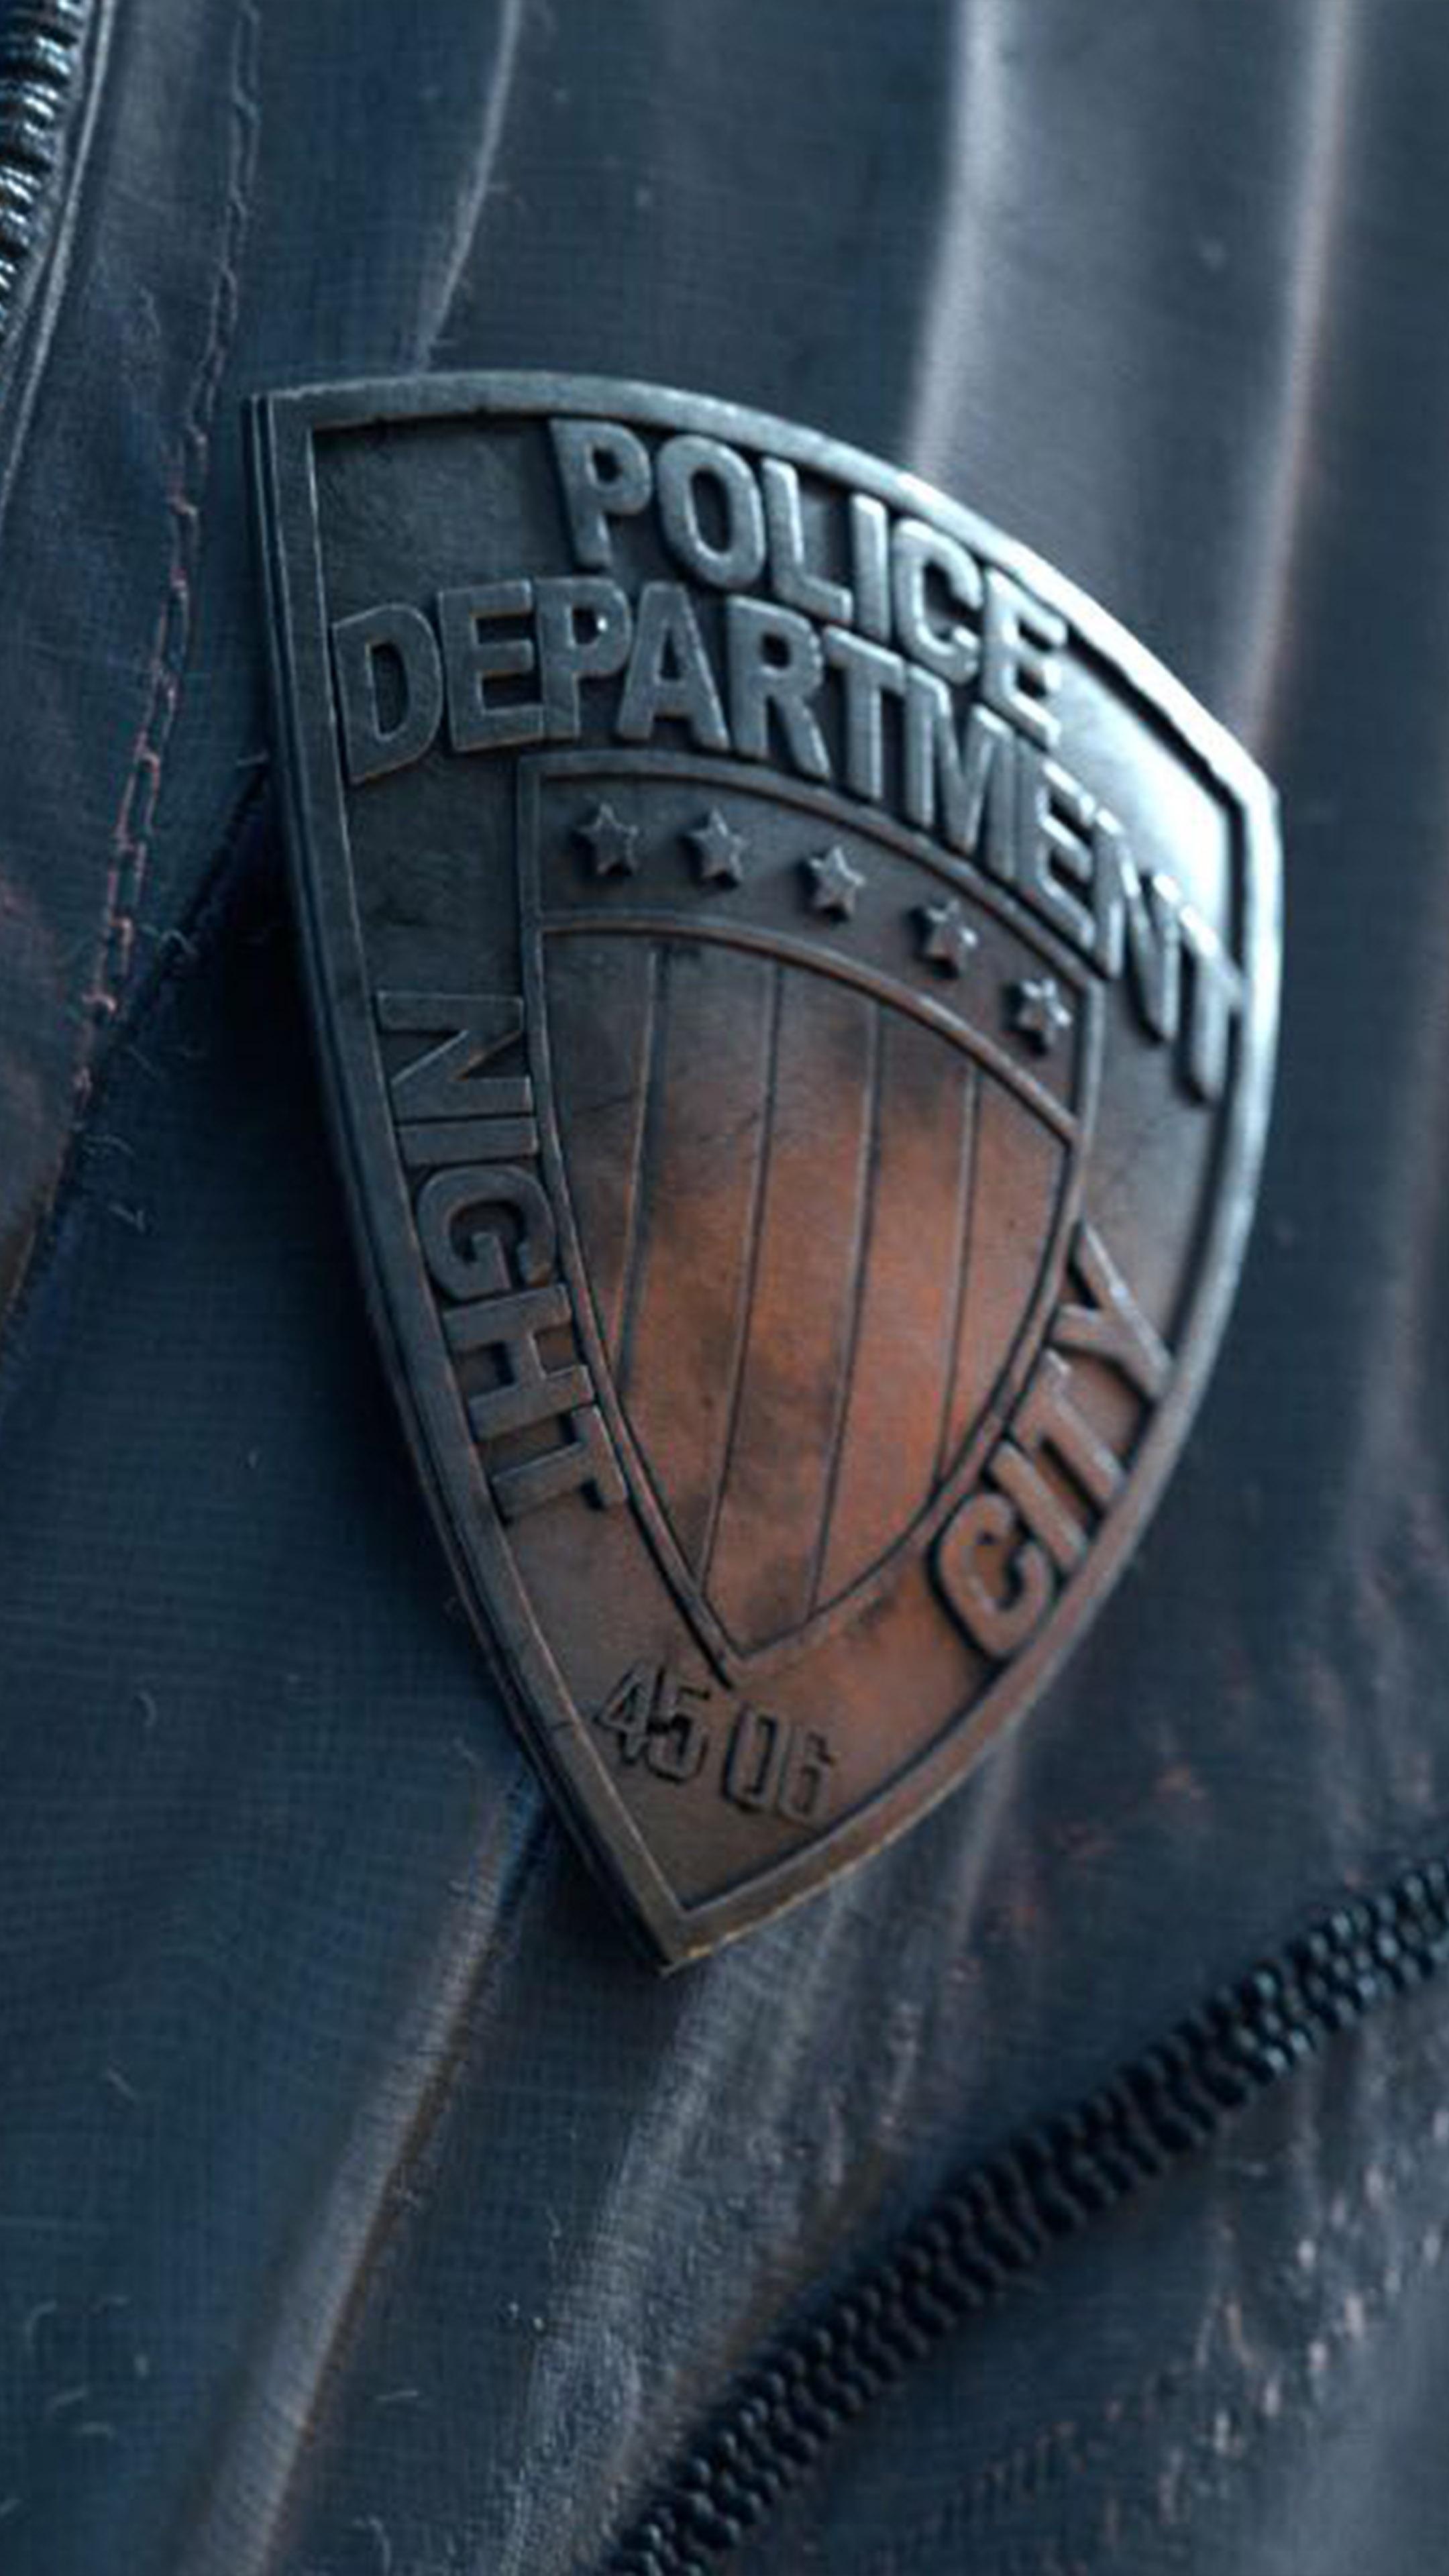 Night City Police Department Cyberpunk 2077 Free 4K Ultra ...